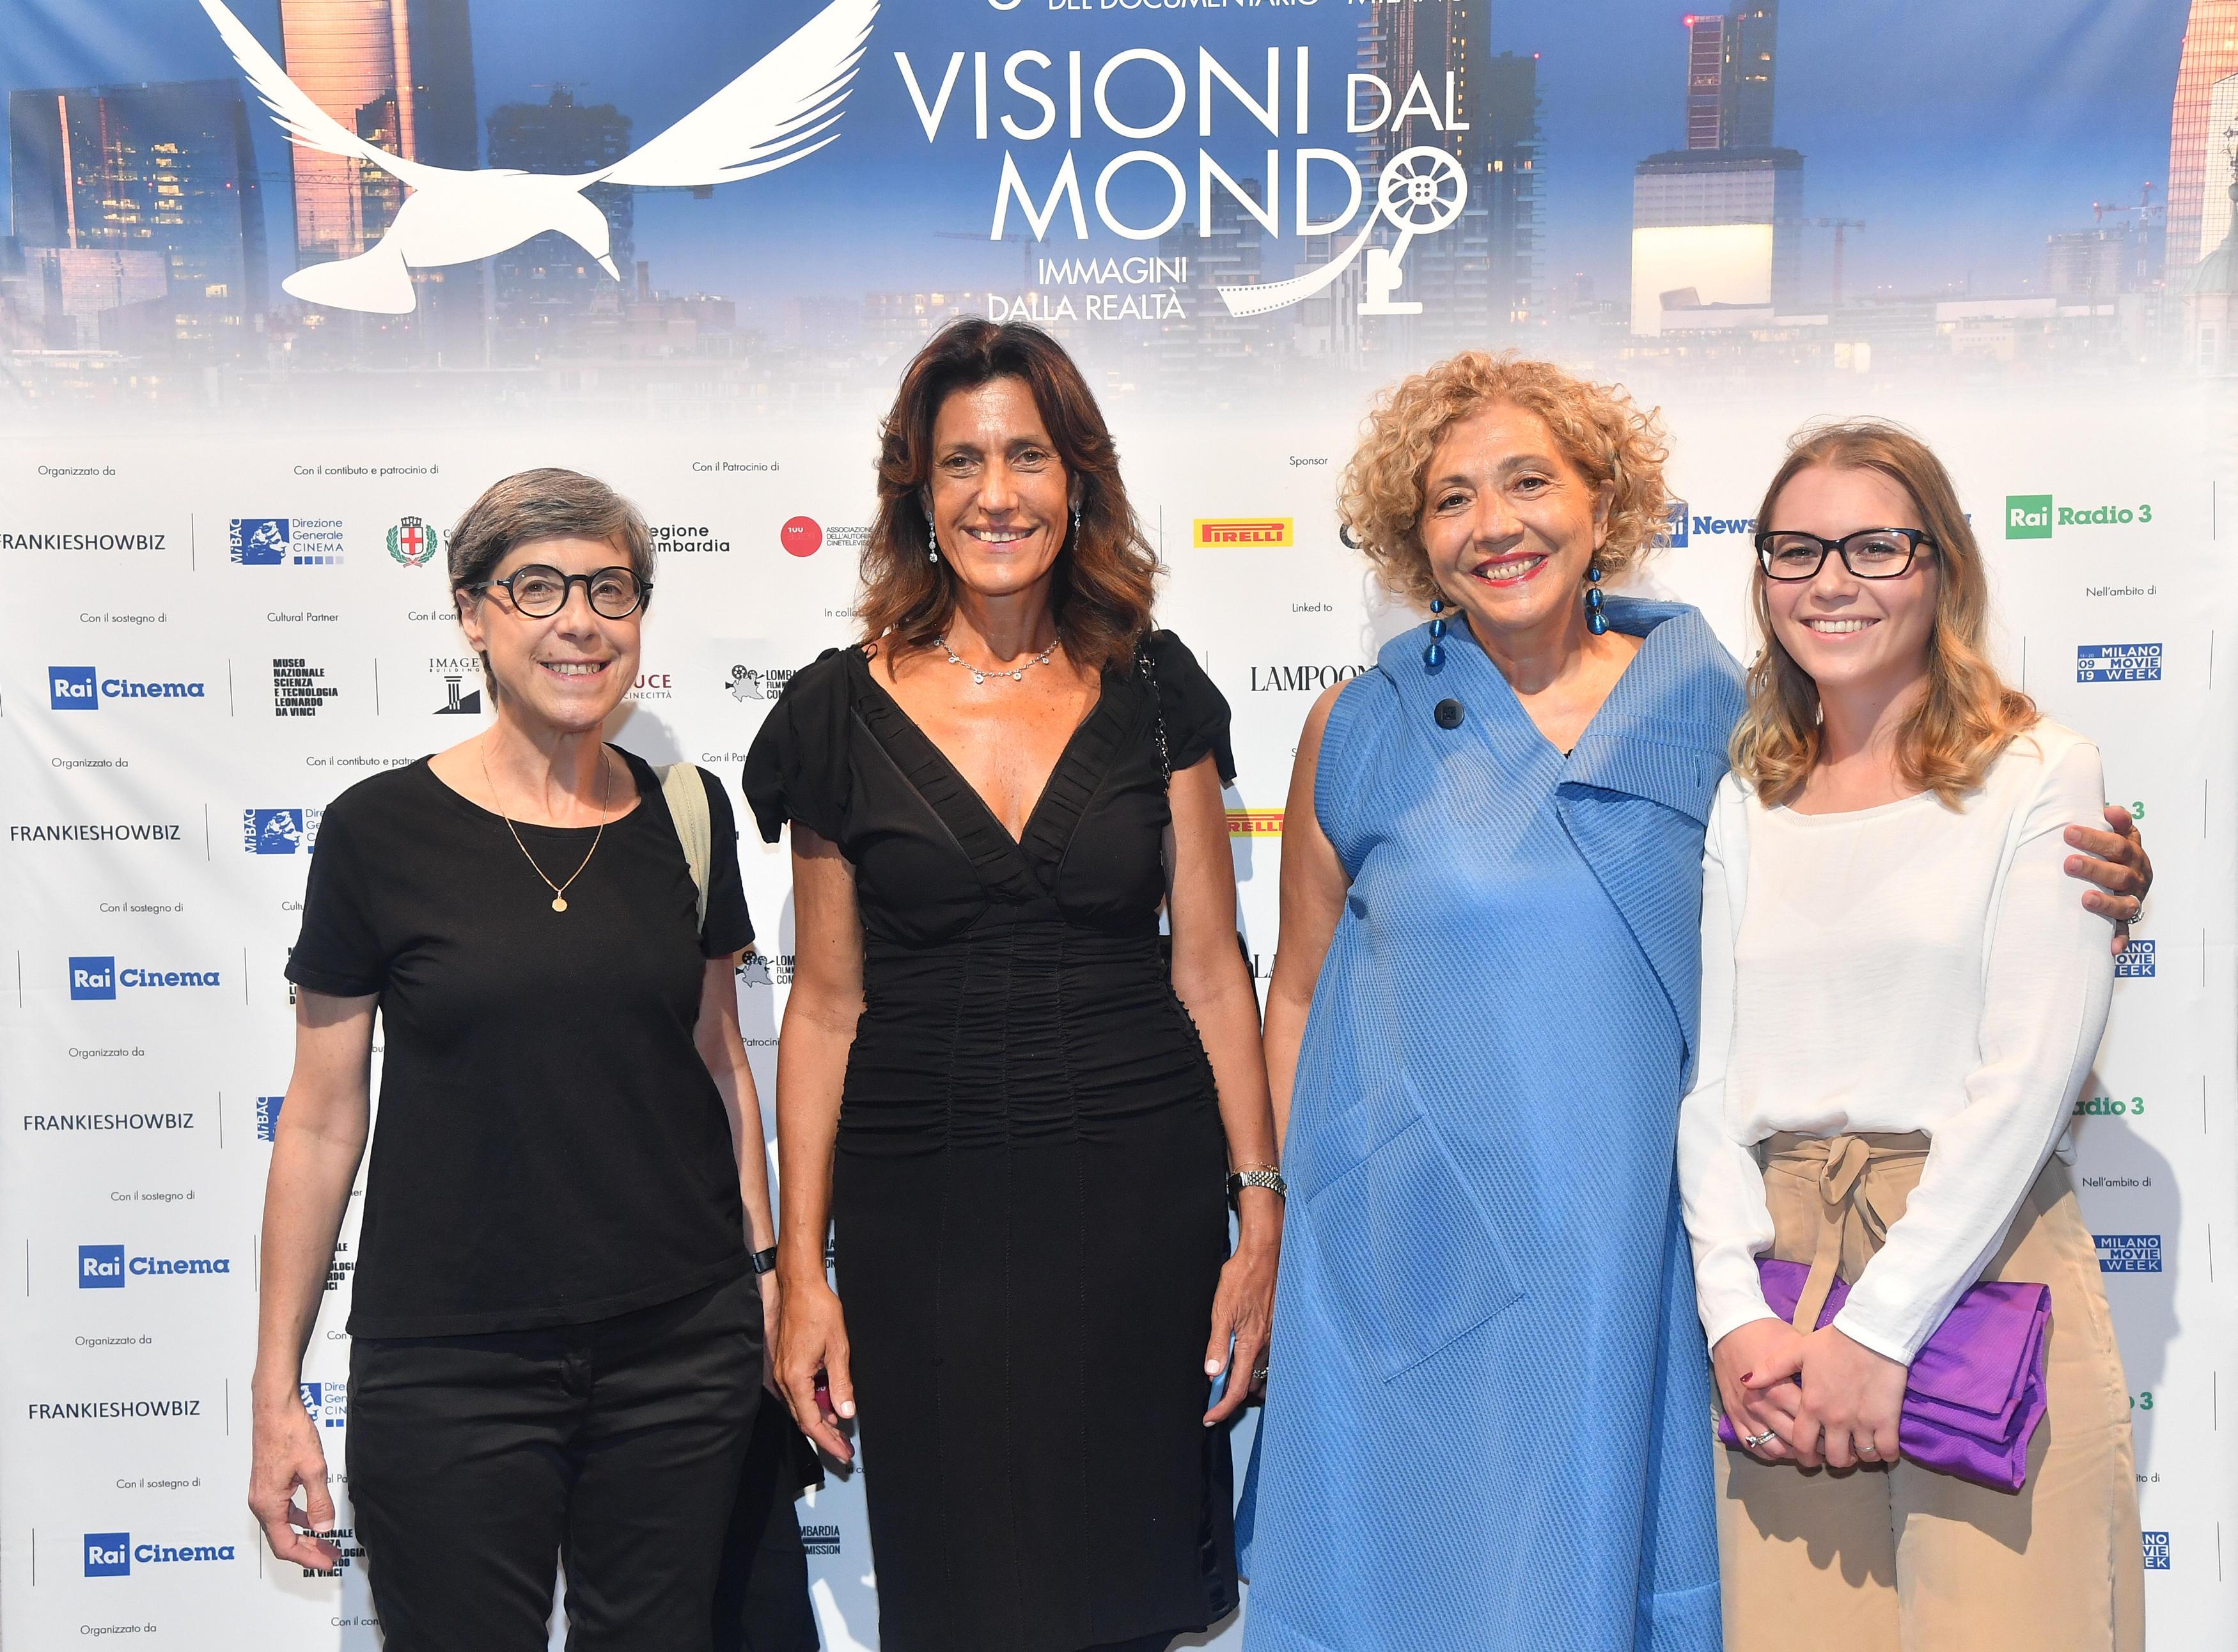 Paola Pierri, Giuliana Paoletti, Presidente Image Building e Claudia Fellus